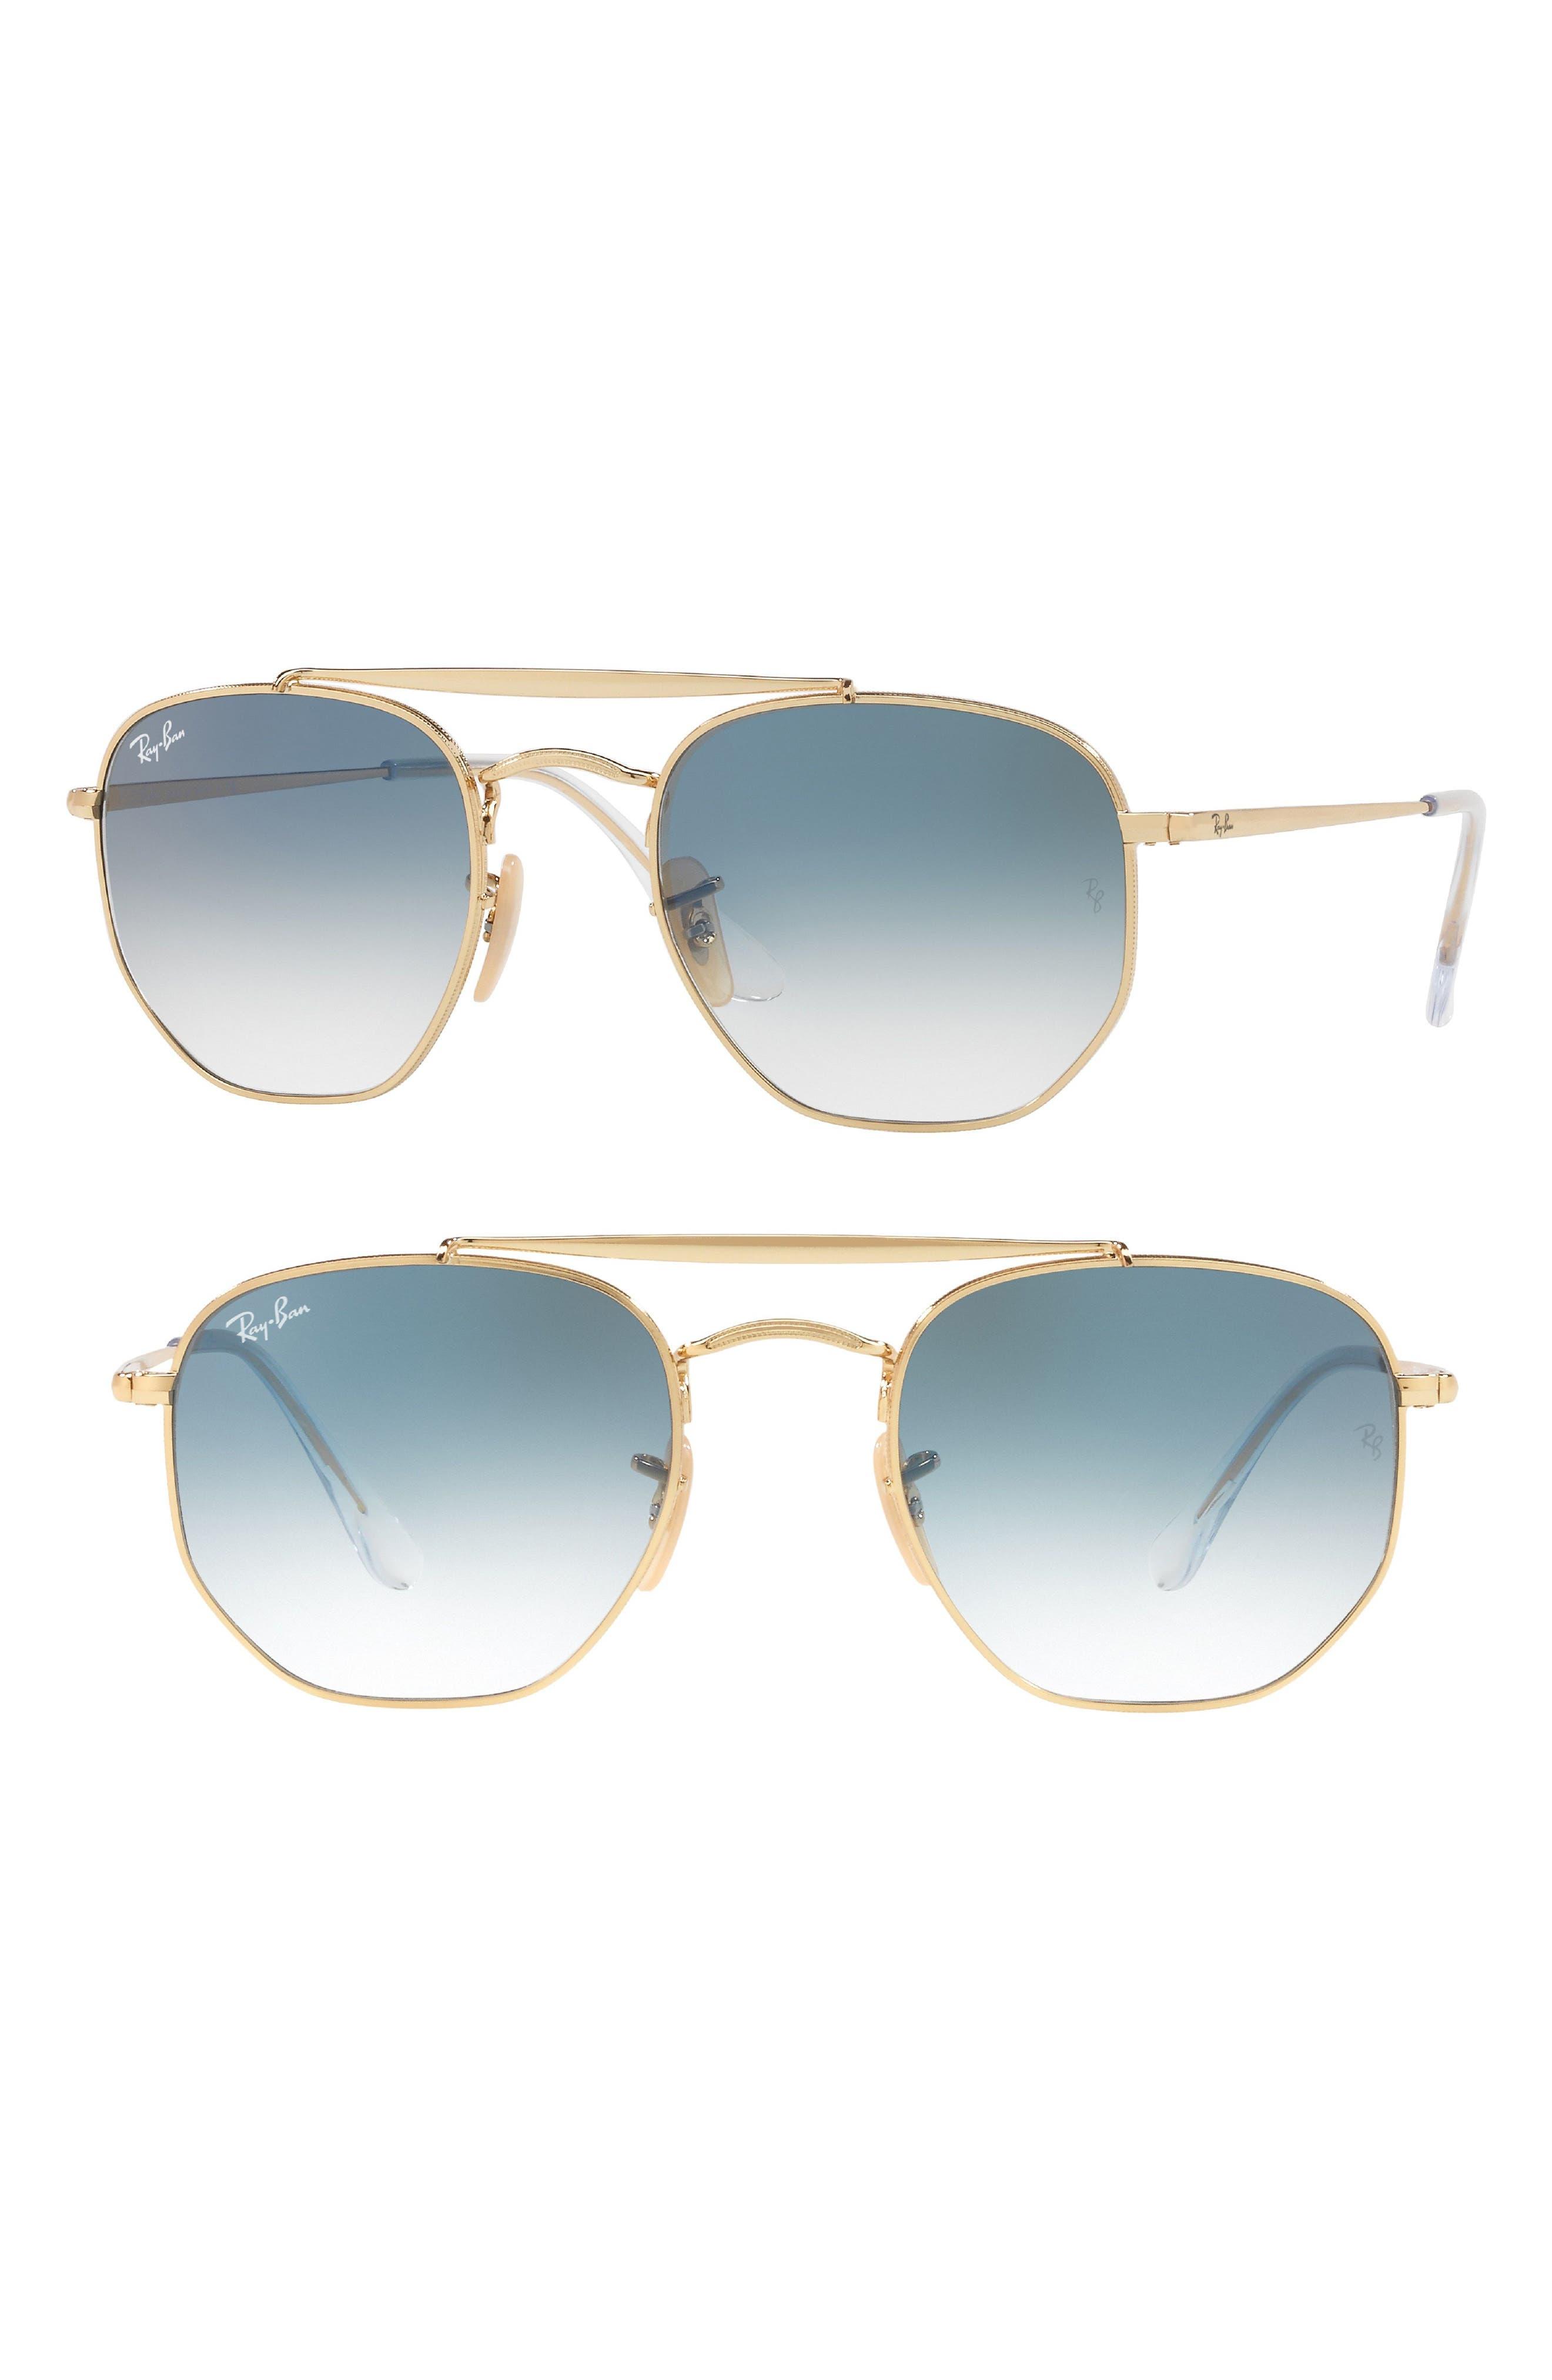 Main Image - Ray-Ban 54mm Gradient Sunglasses